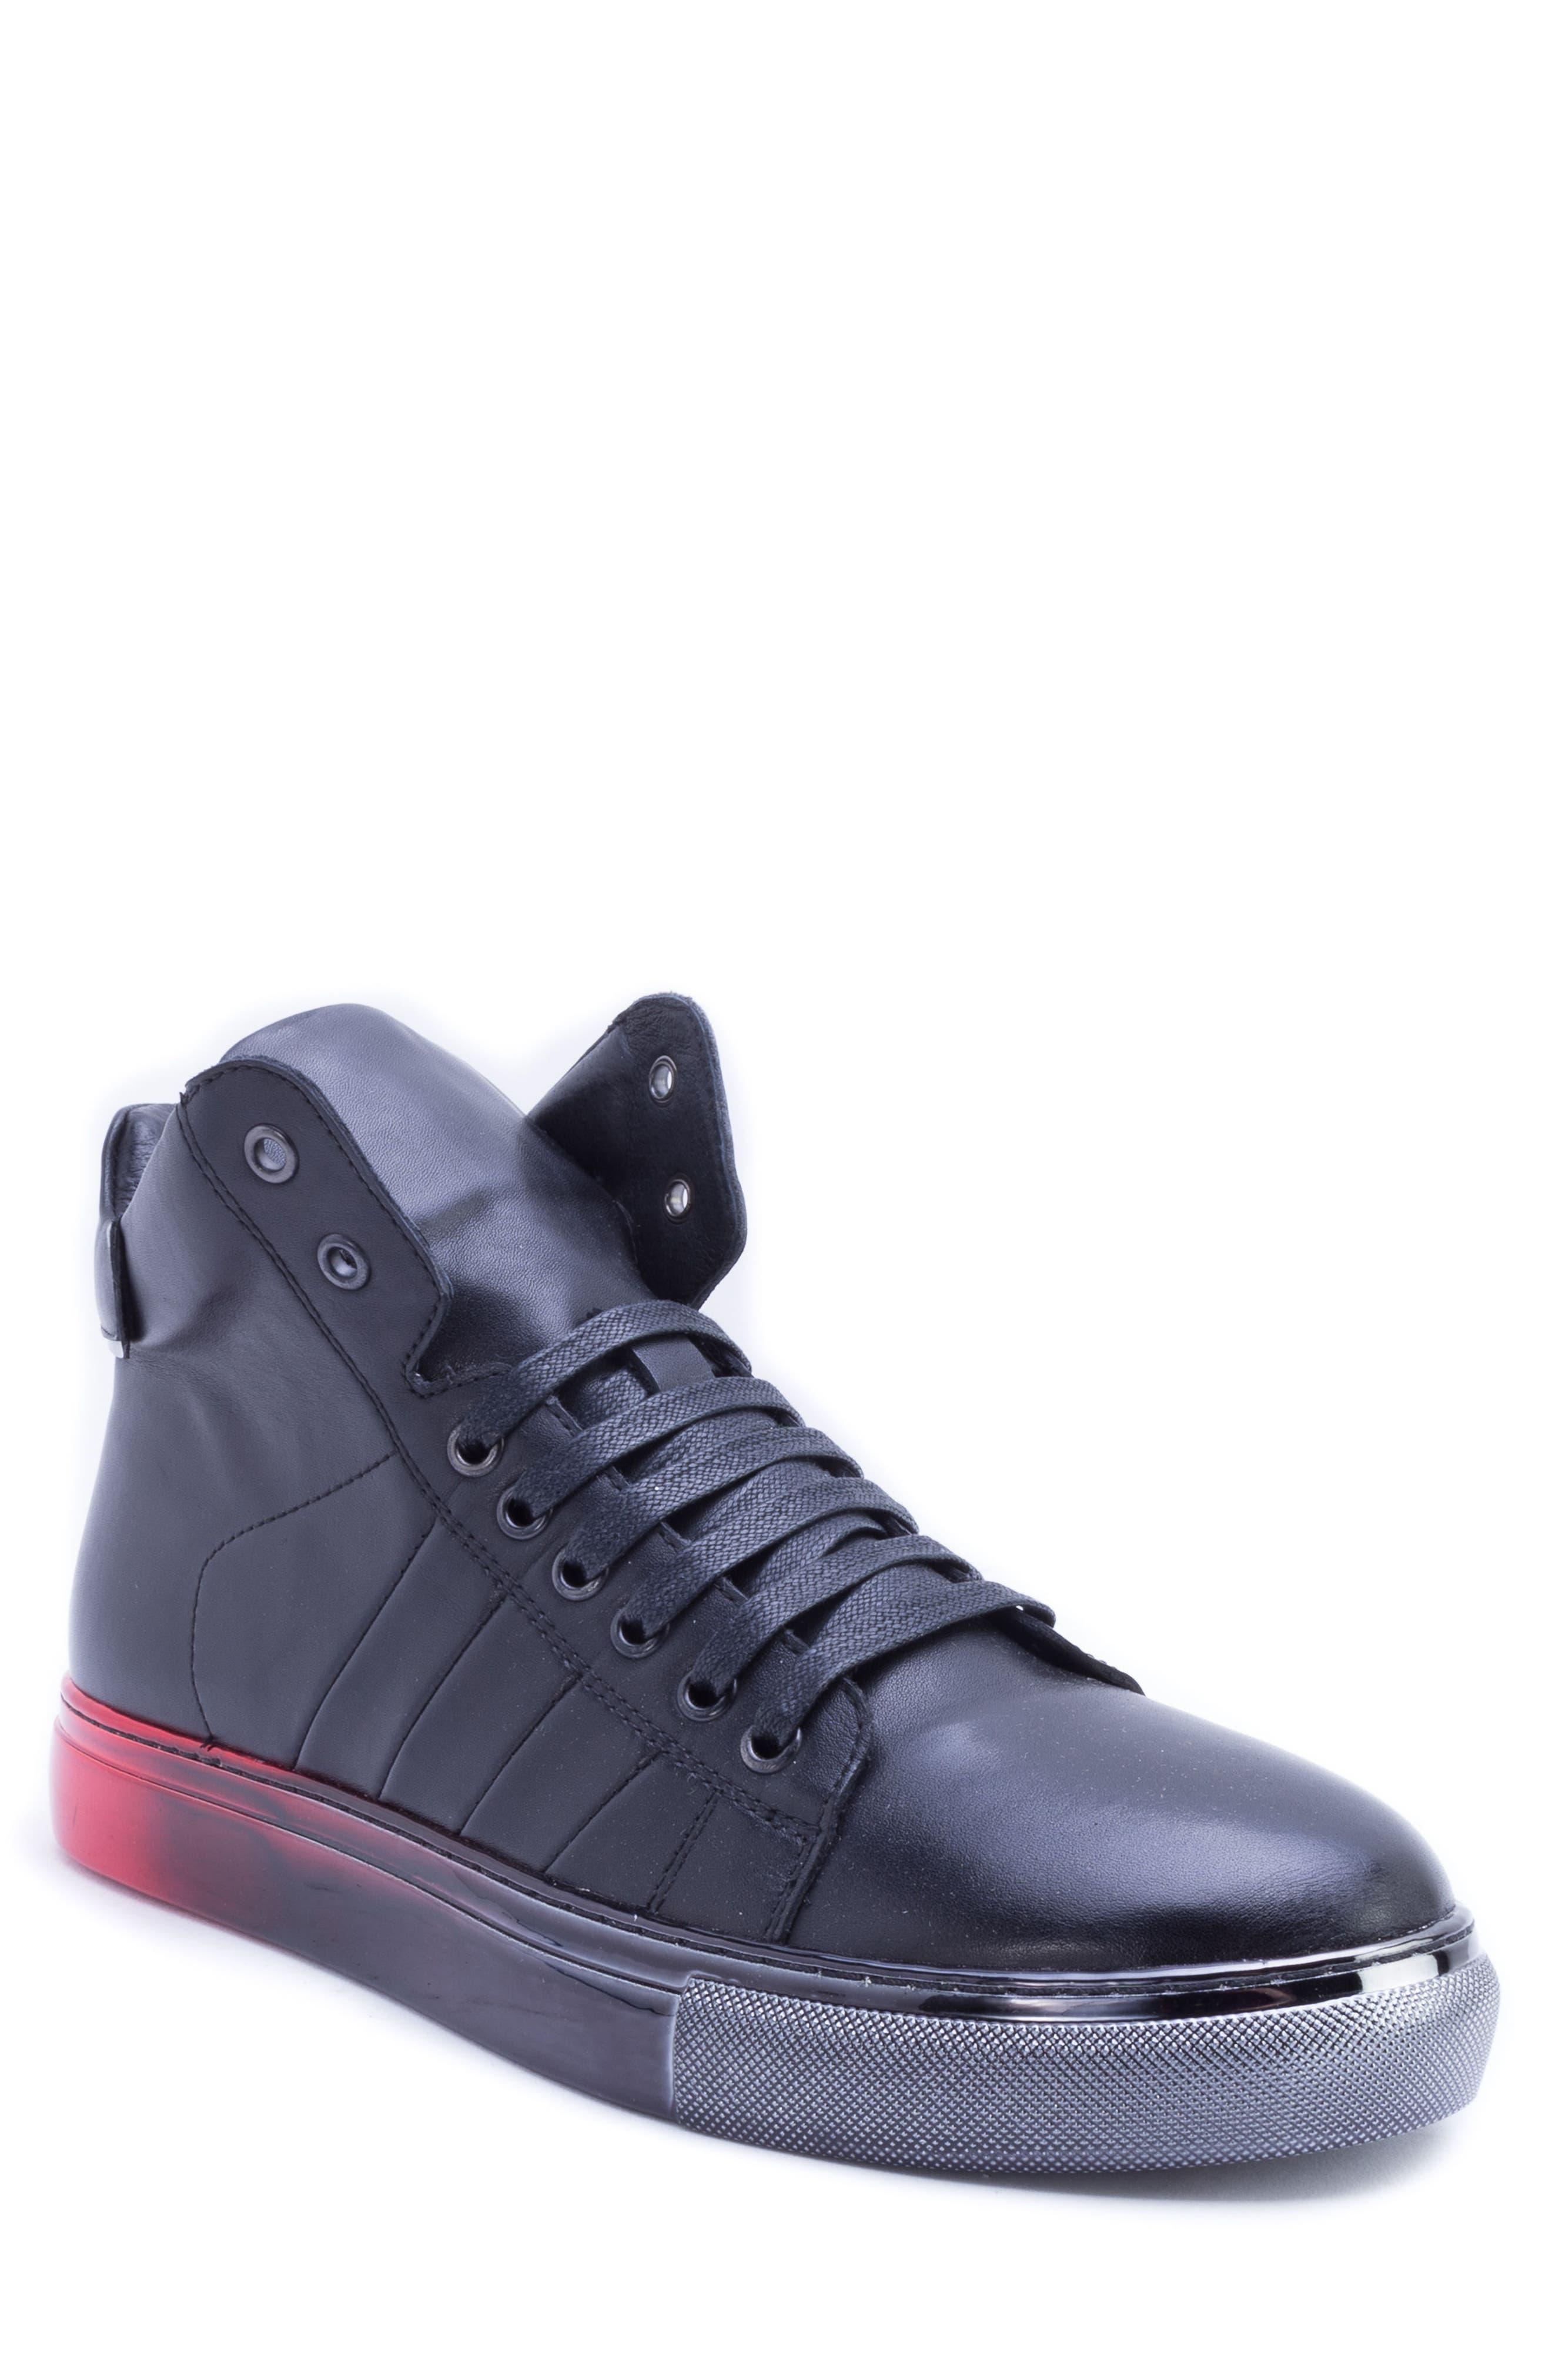 Badgley Mischka Bronson Sneaker- Black